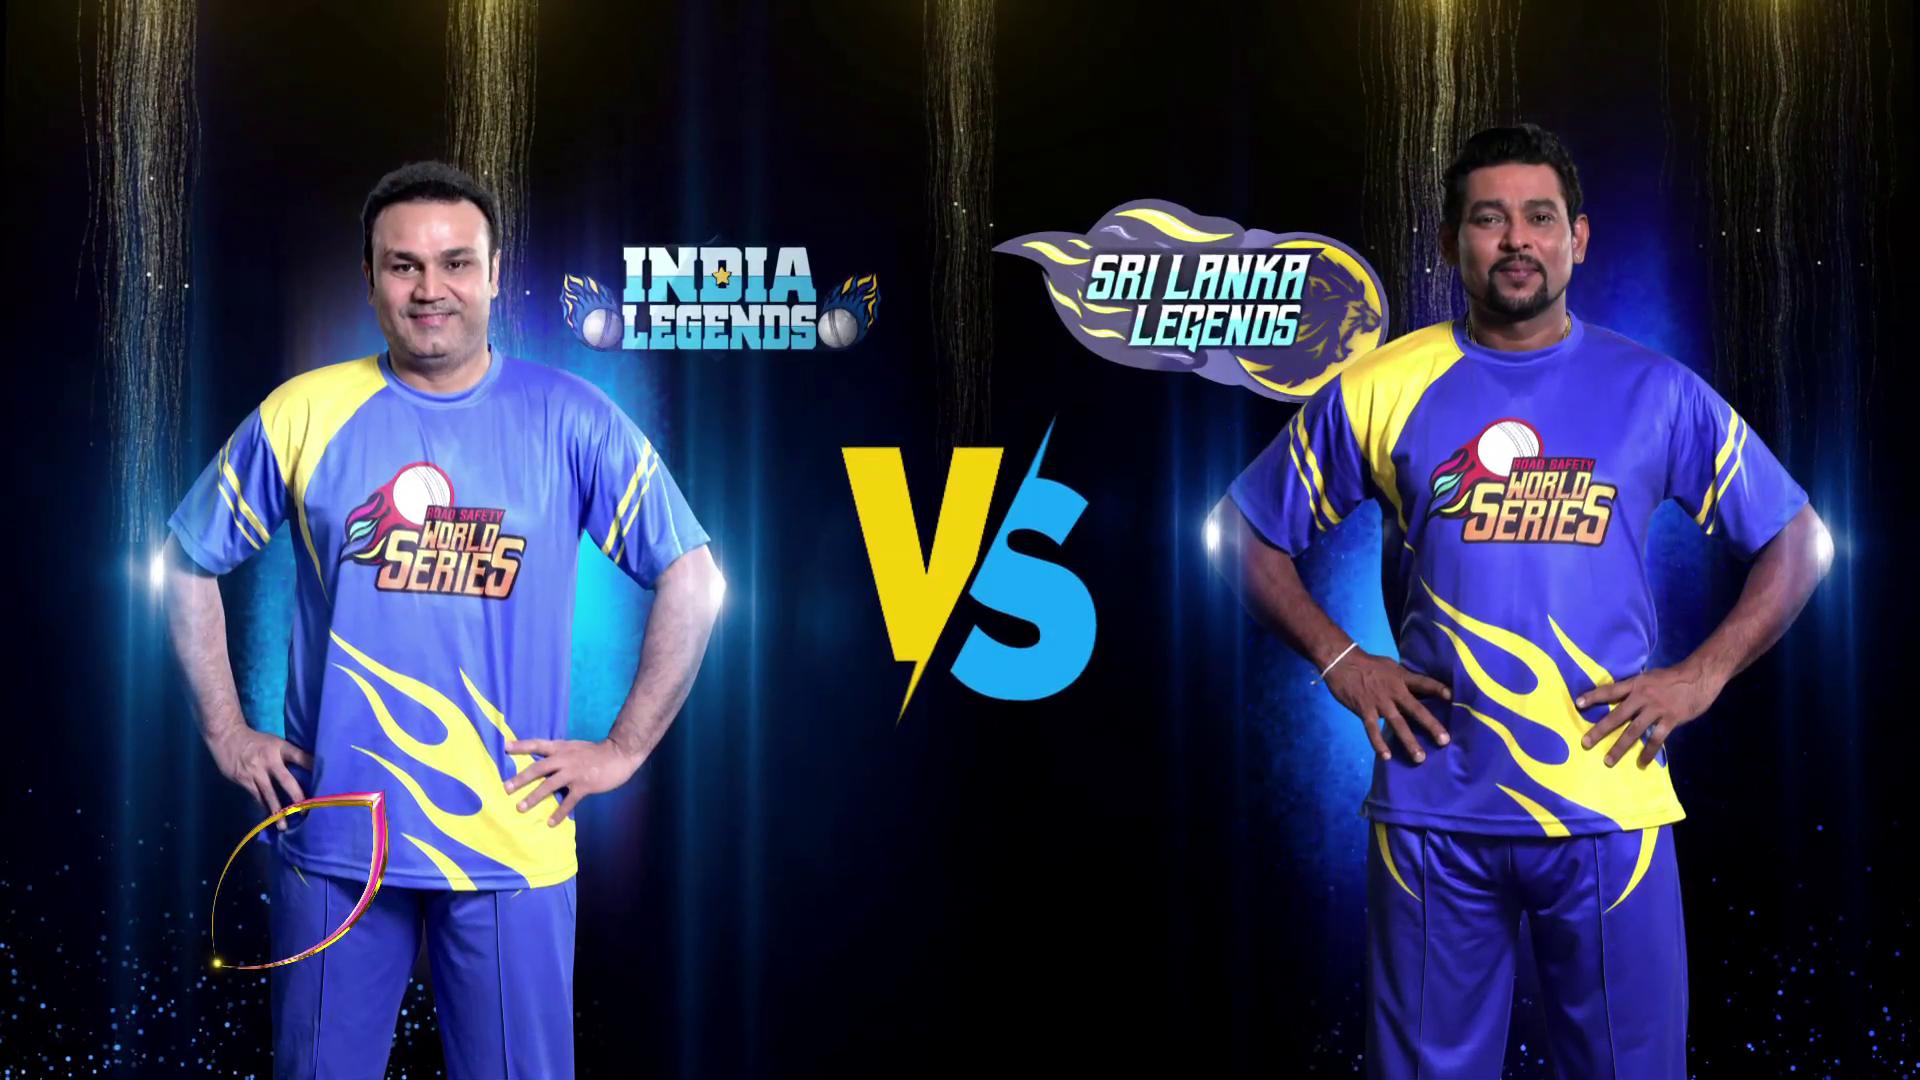 Road Safety World Series 7th March Se Live, Dekhiye Cricket Ki Rivalry Sehwag Vs Dilshan Ke beech!